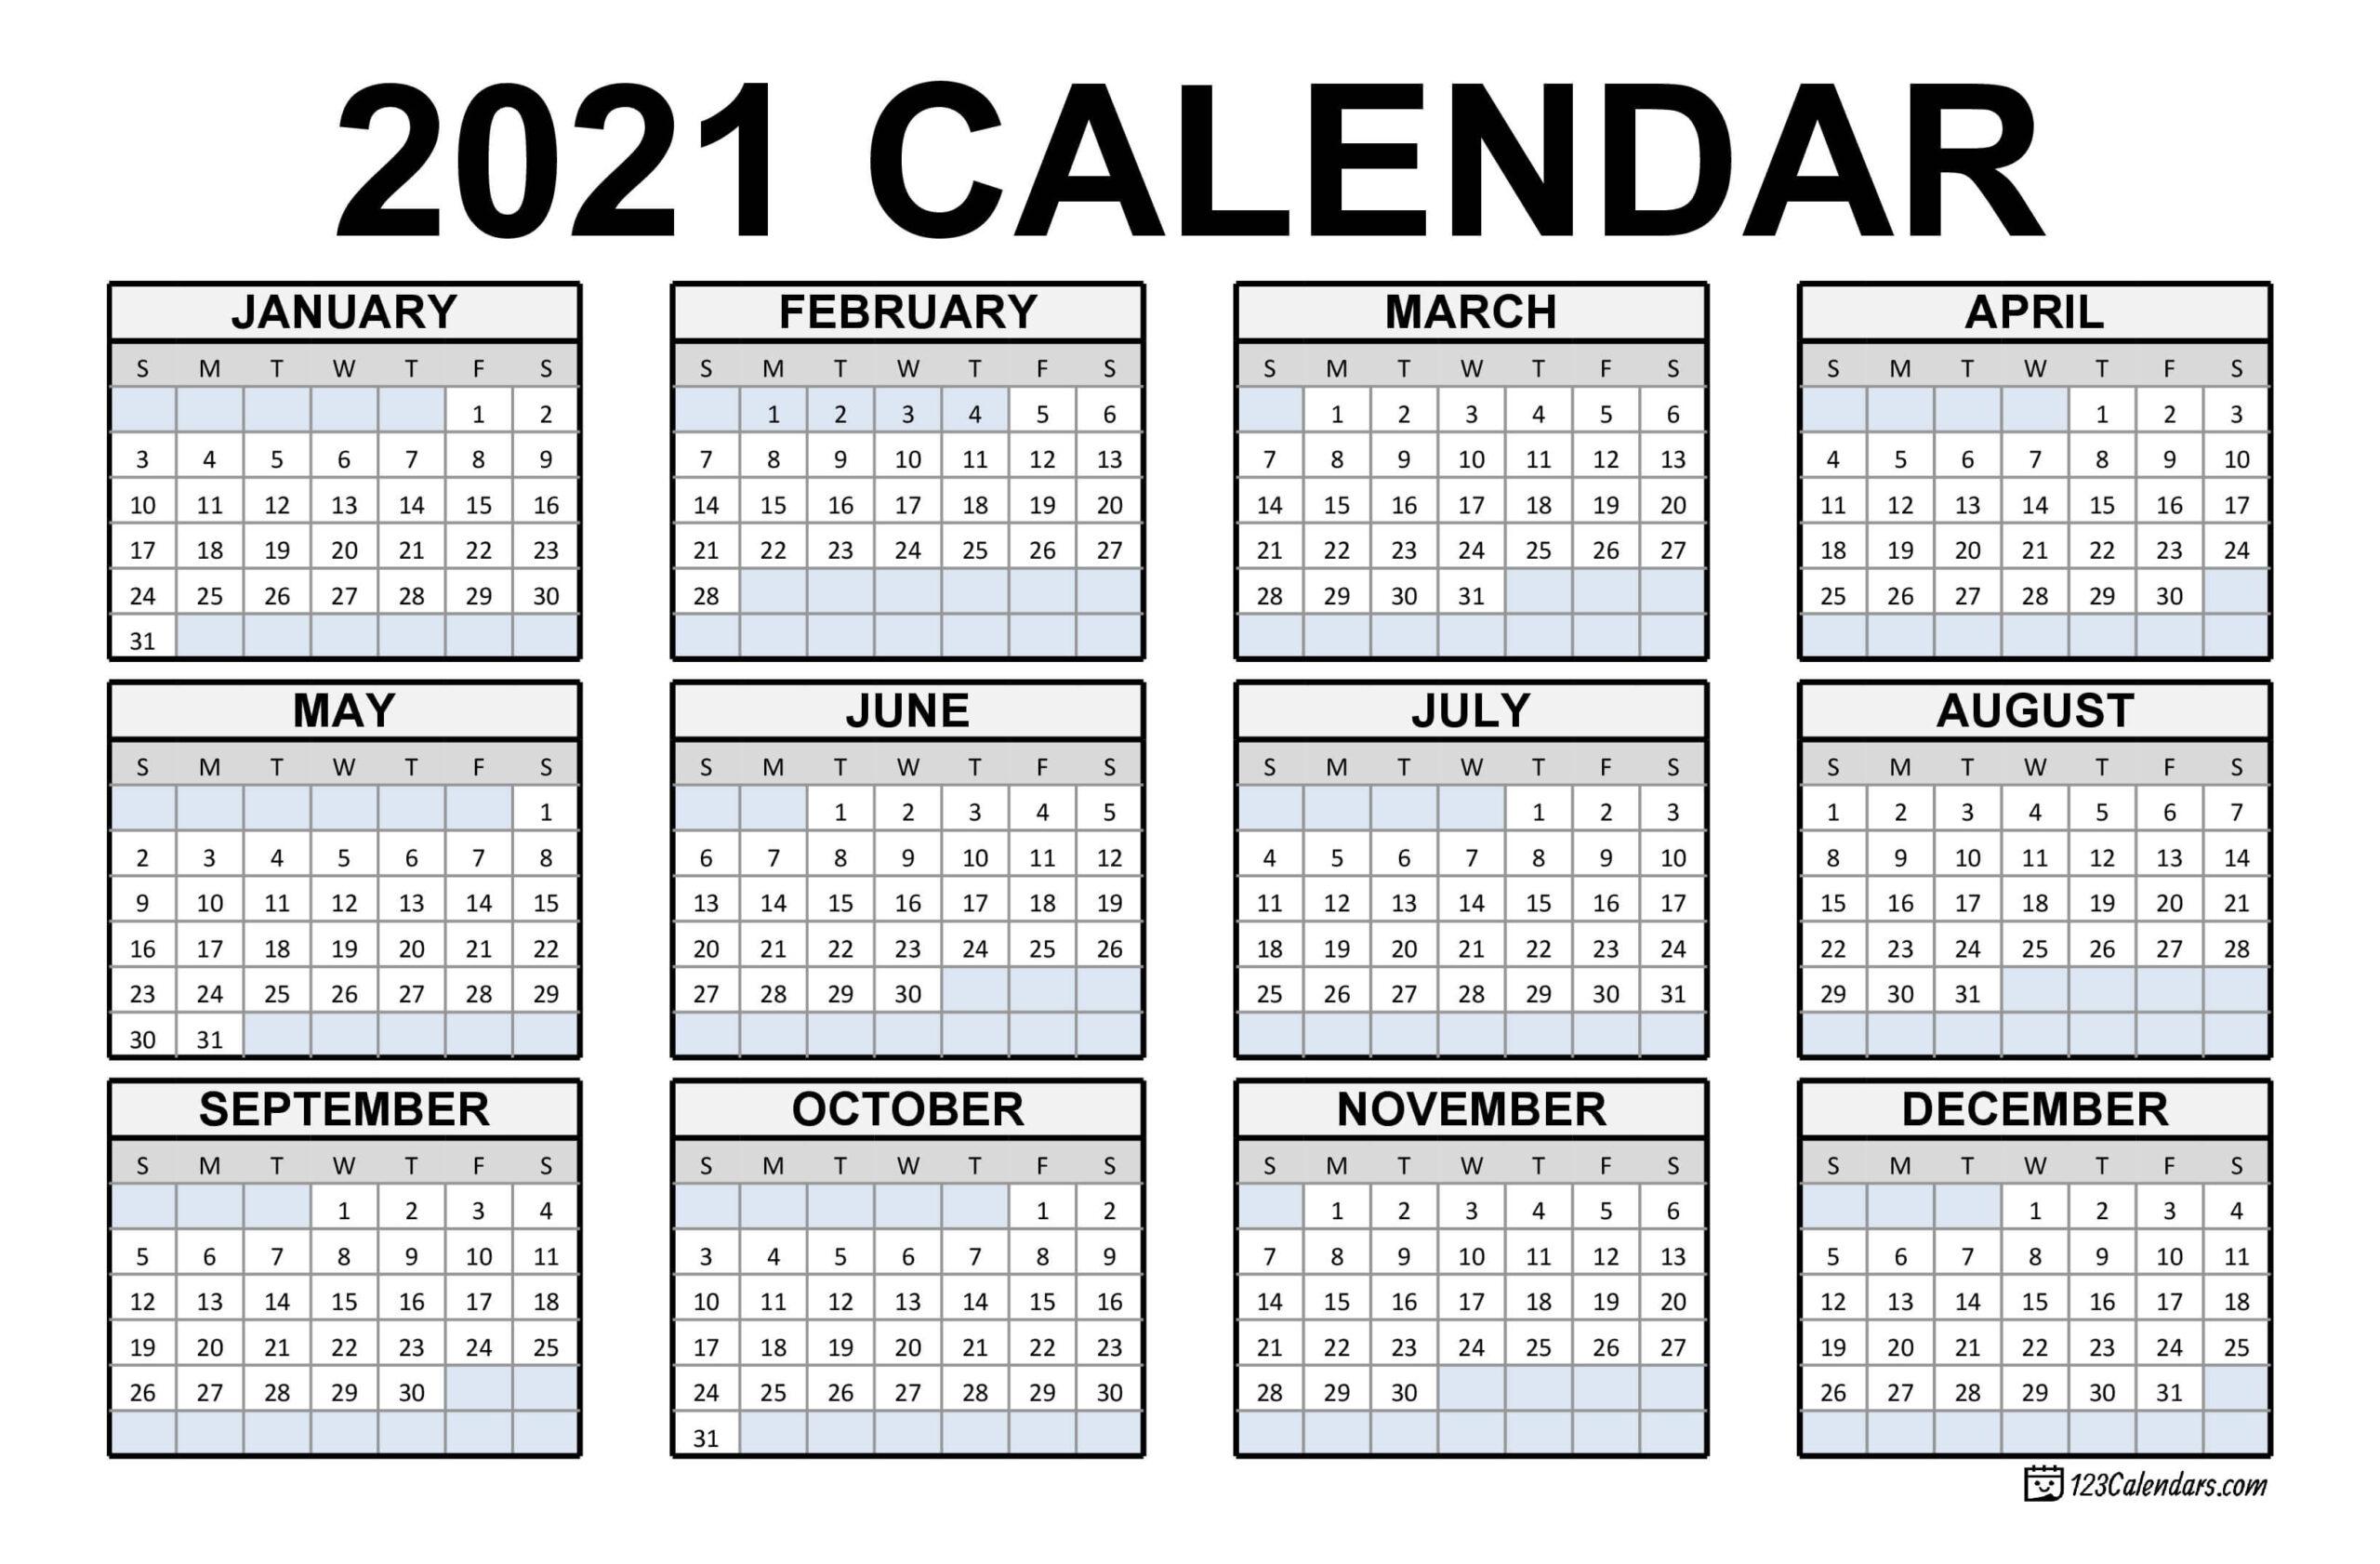 2021 Printable Calendar Free With Federal Holidays